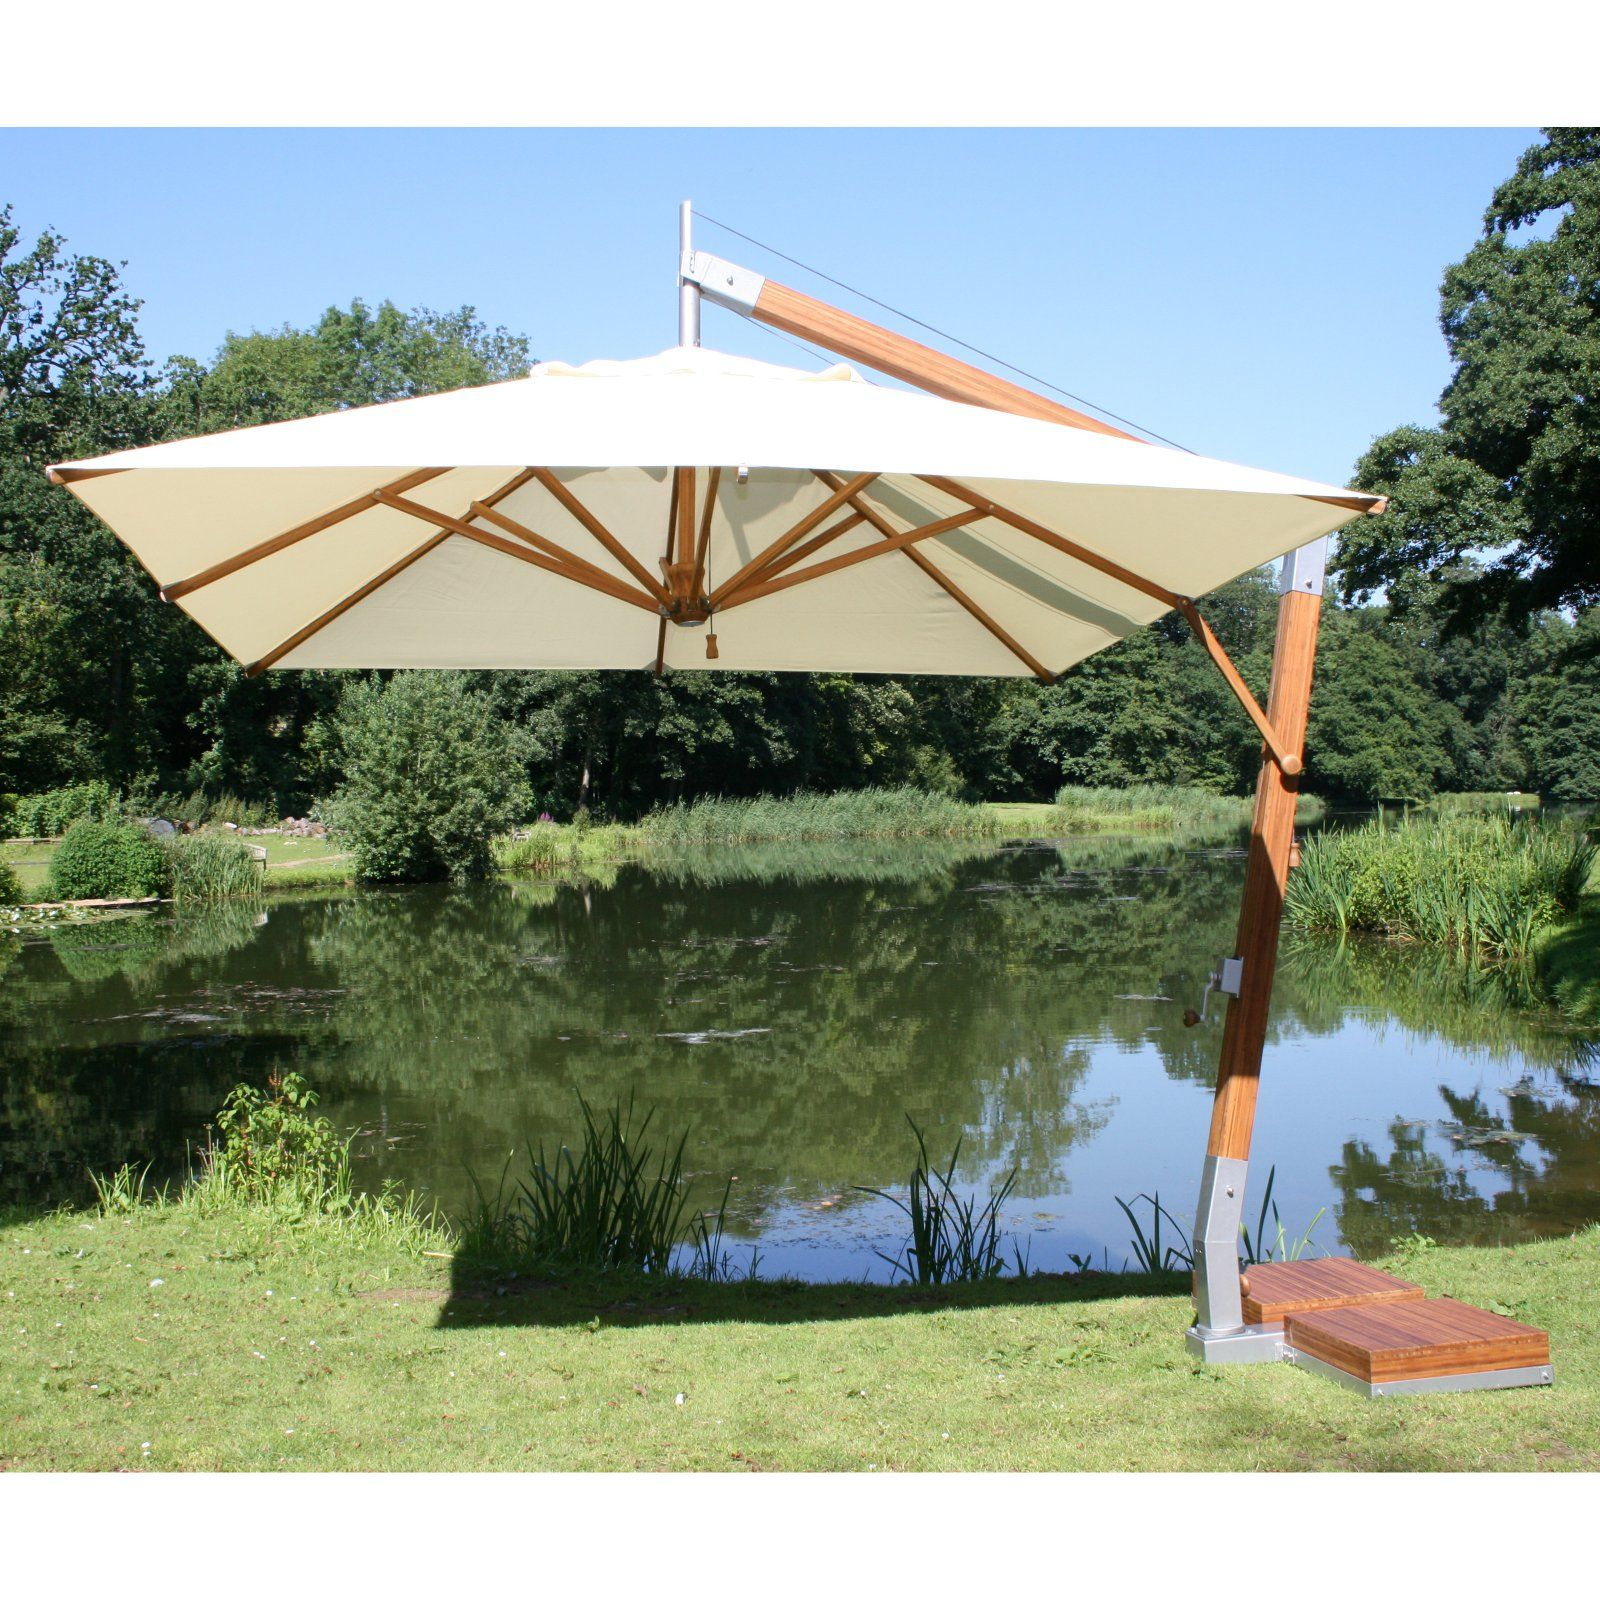 Bambrella 8.5 X 11.5 Ft. Rectangular Bamboo Cantilever Umbrella Ice White Products In 2019